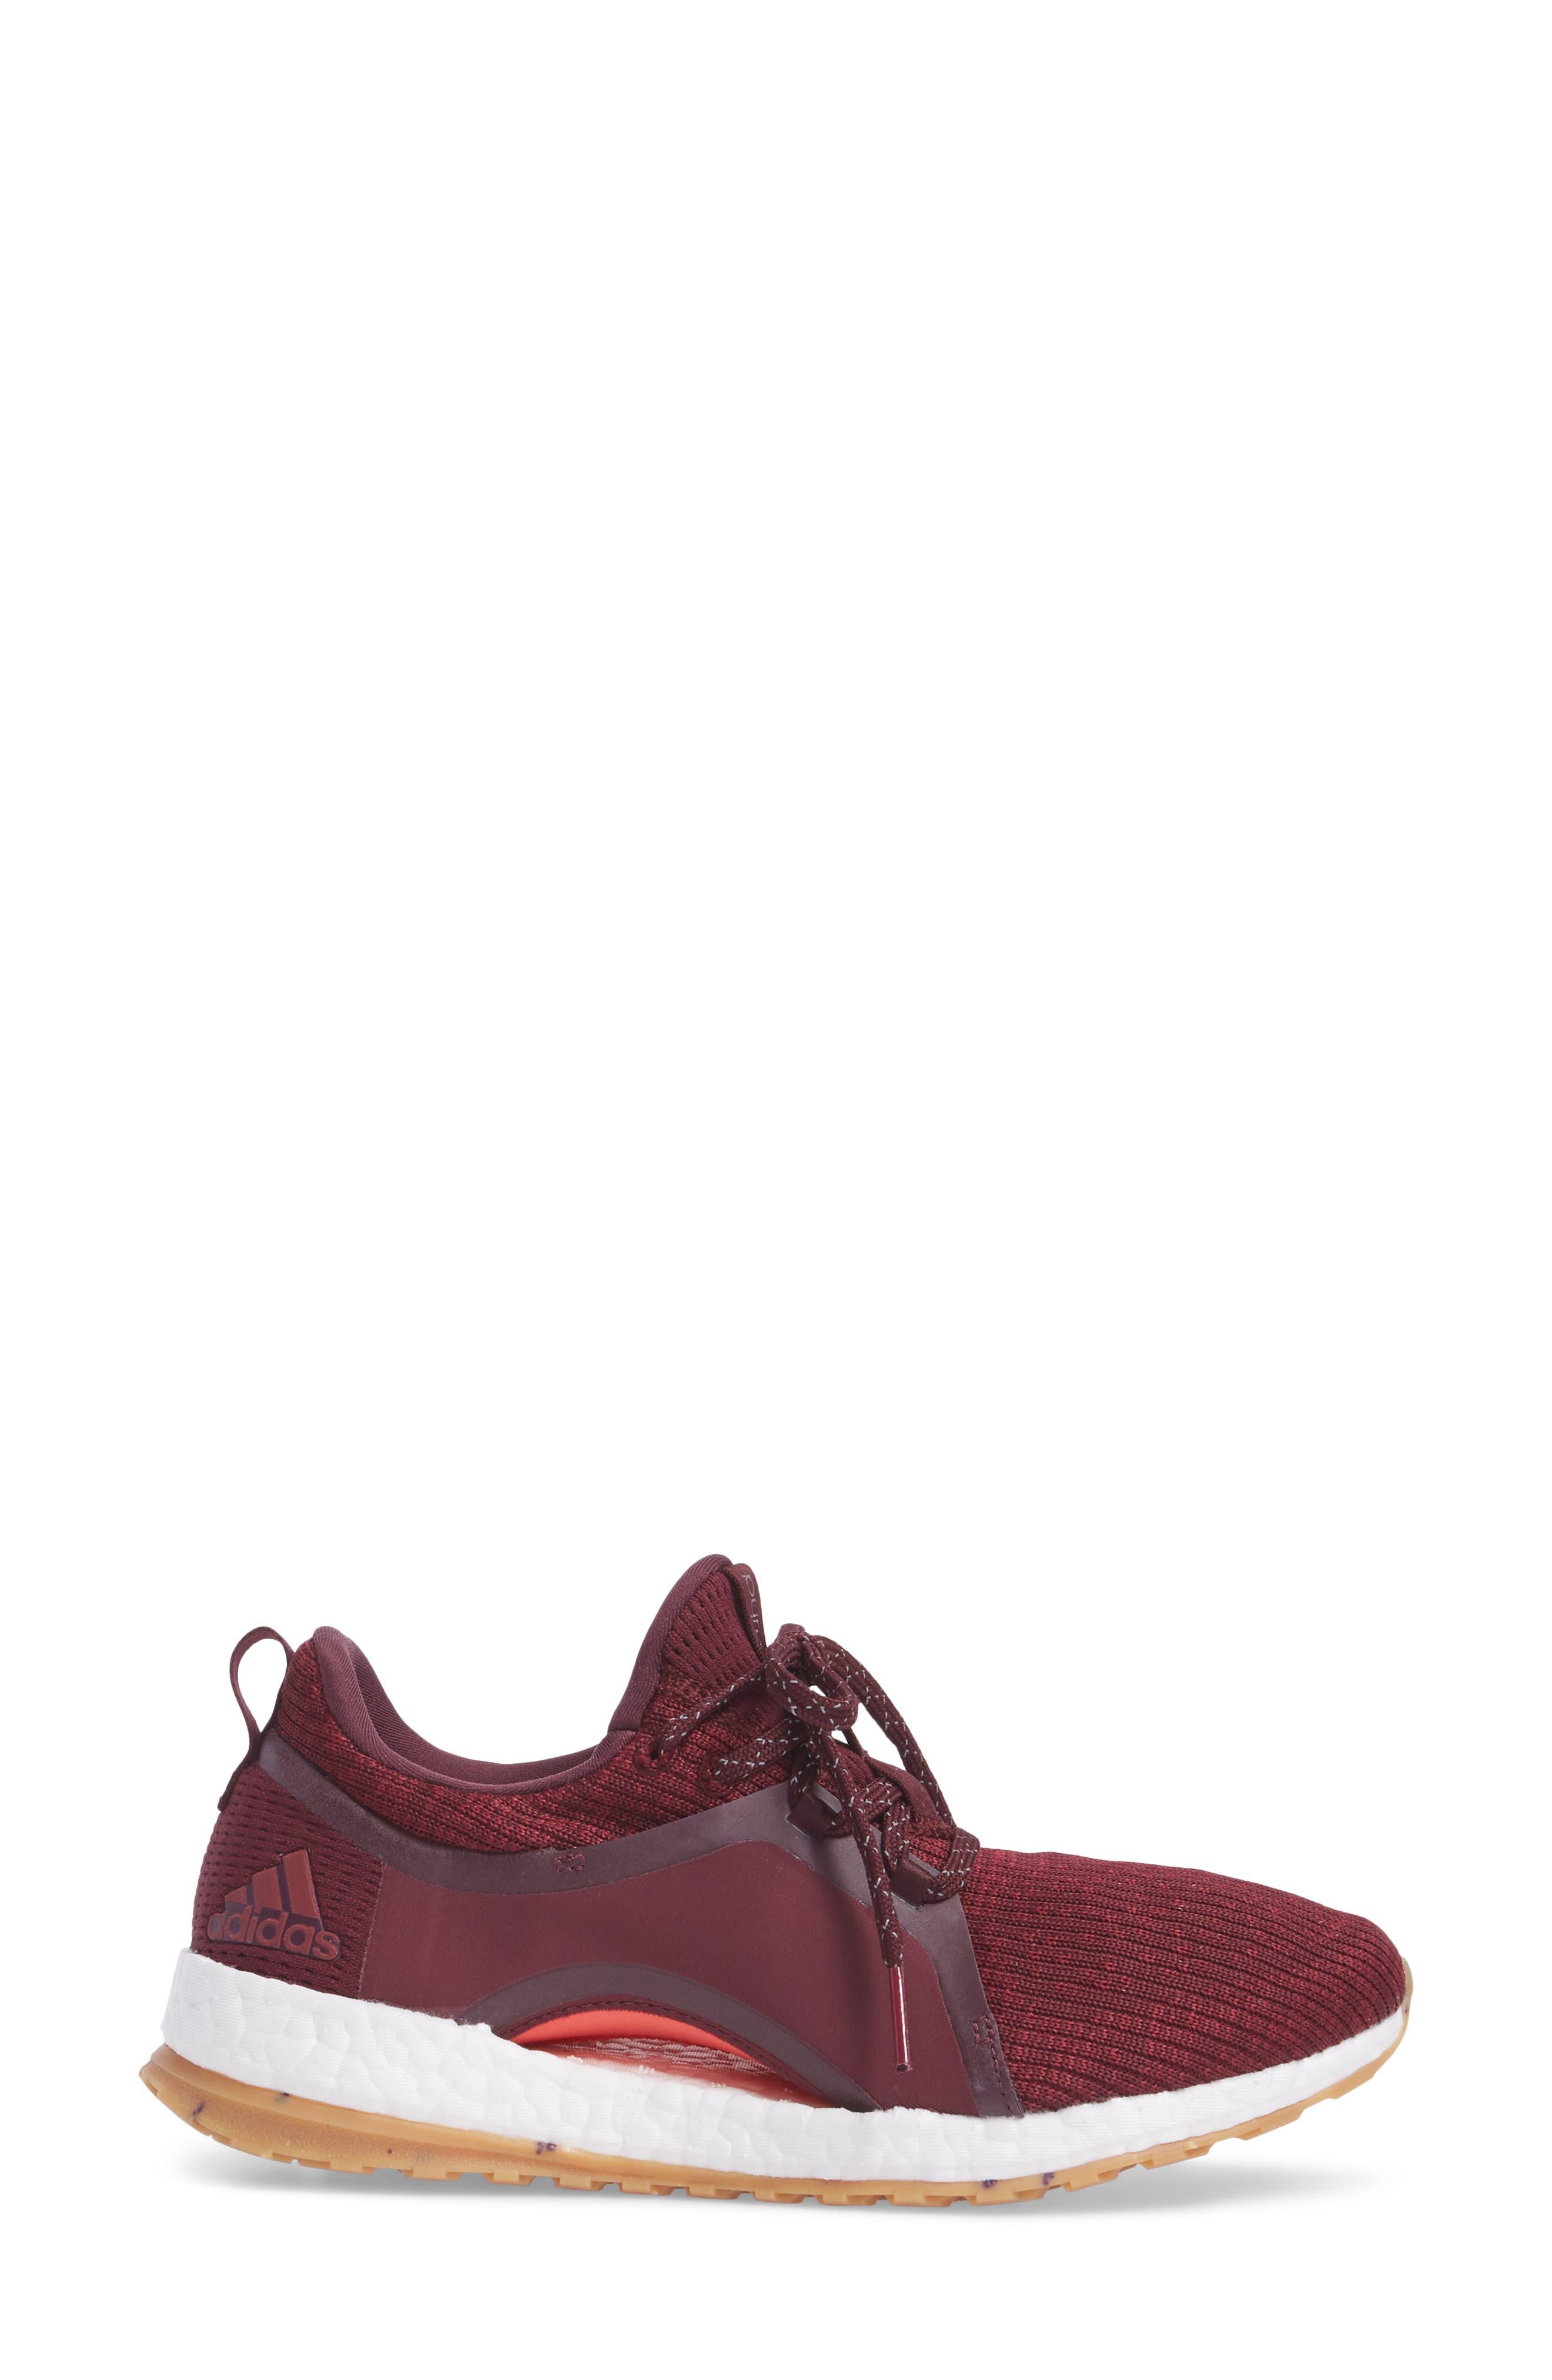 PureBoost X ATR Running Shoe,                             Alternate thumbnail 12, color,